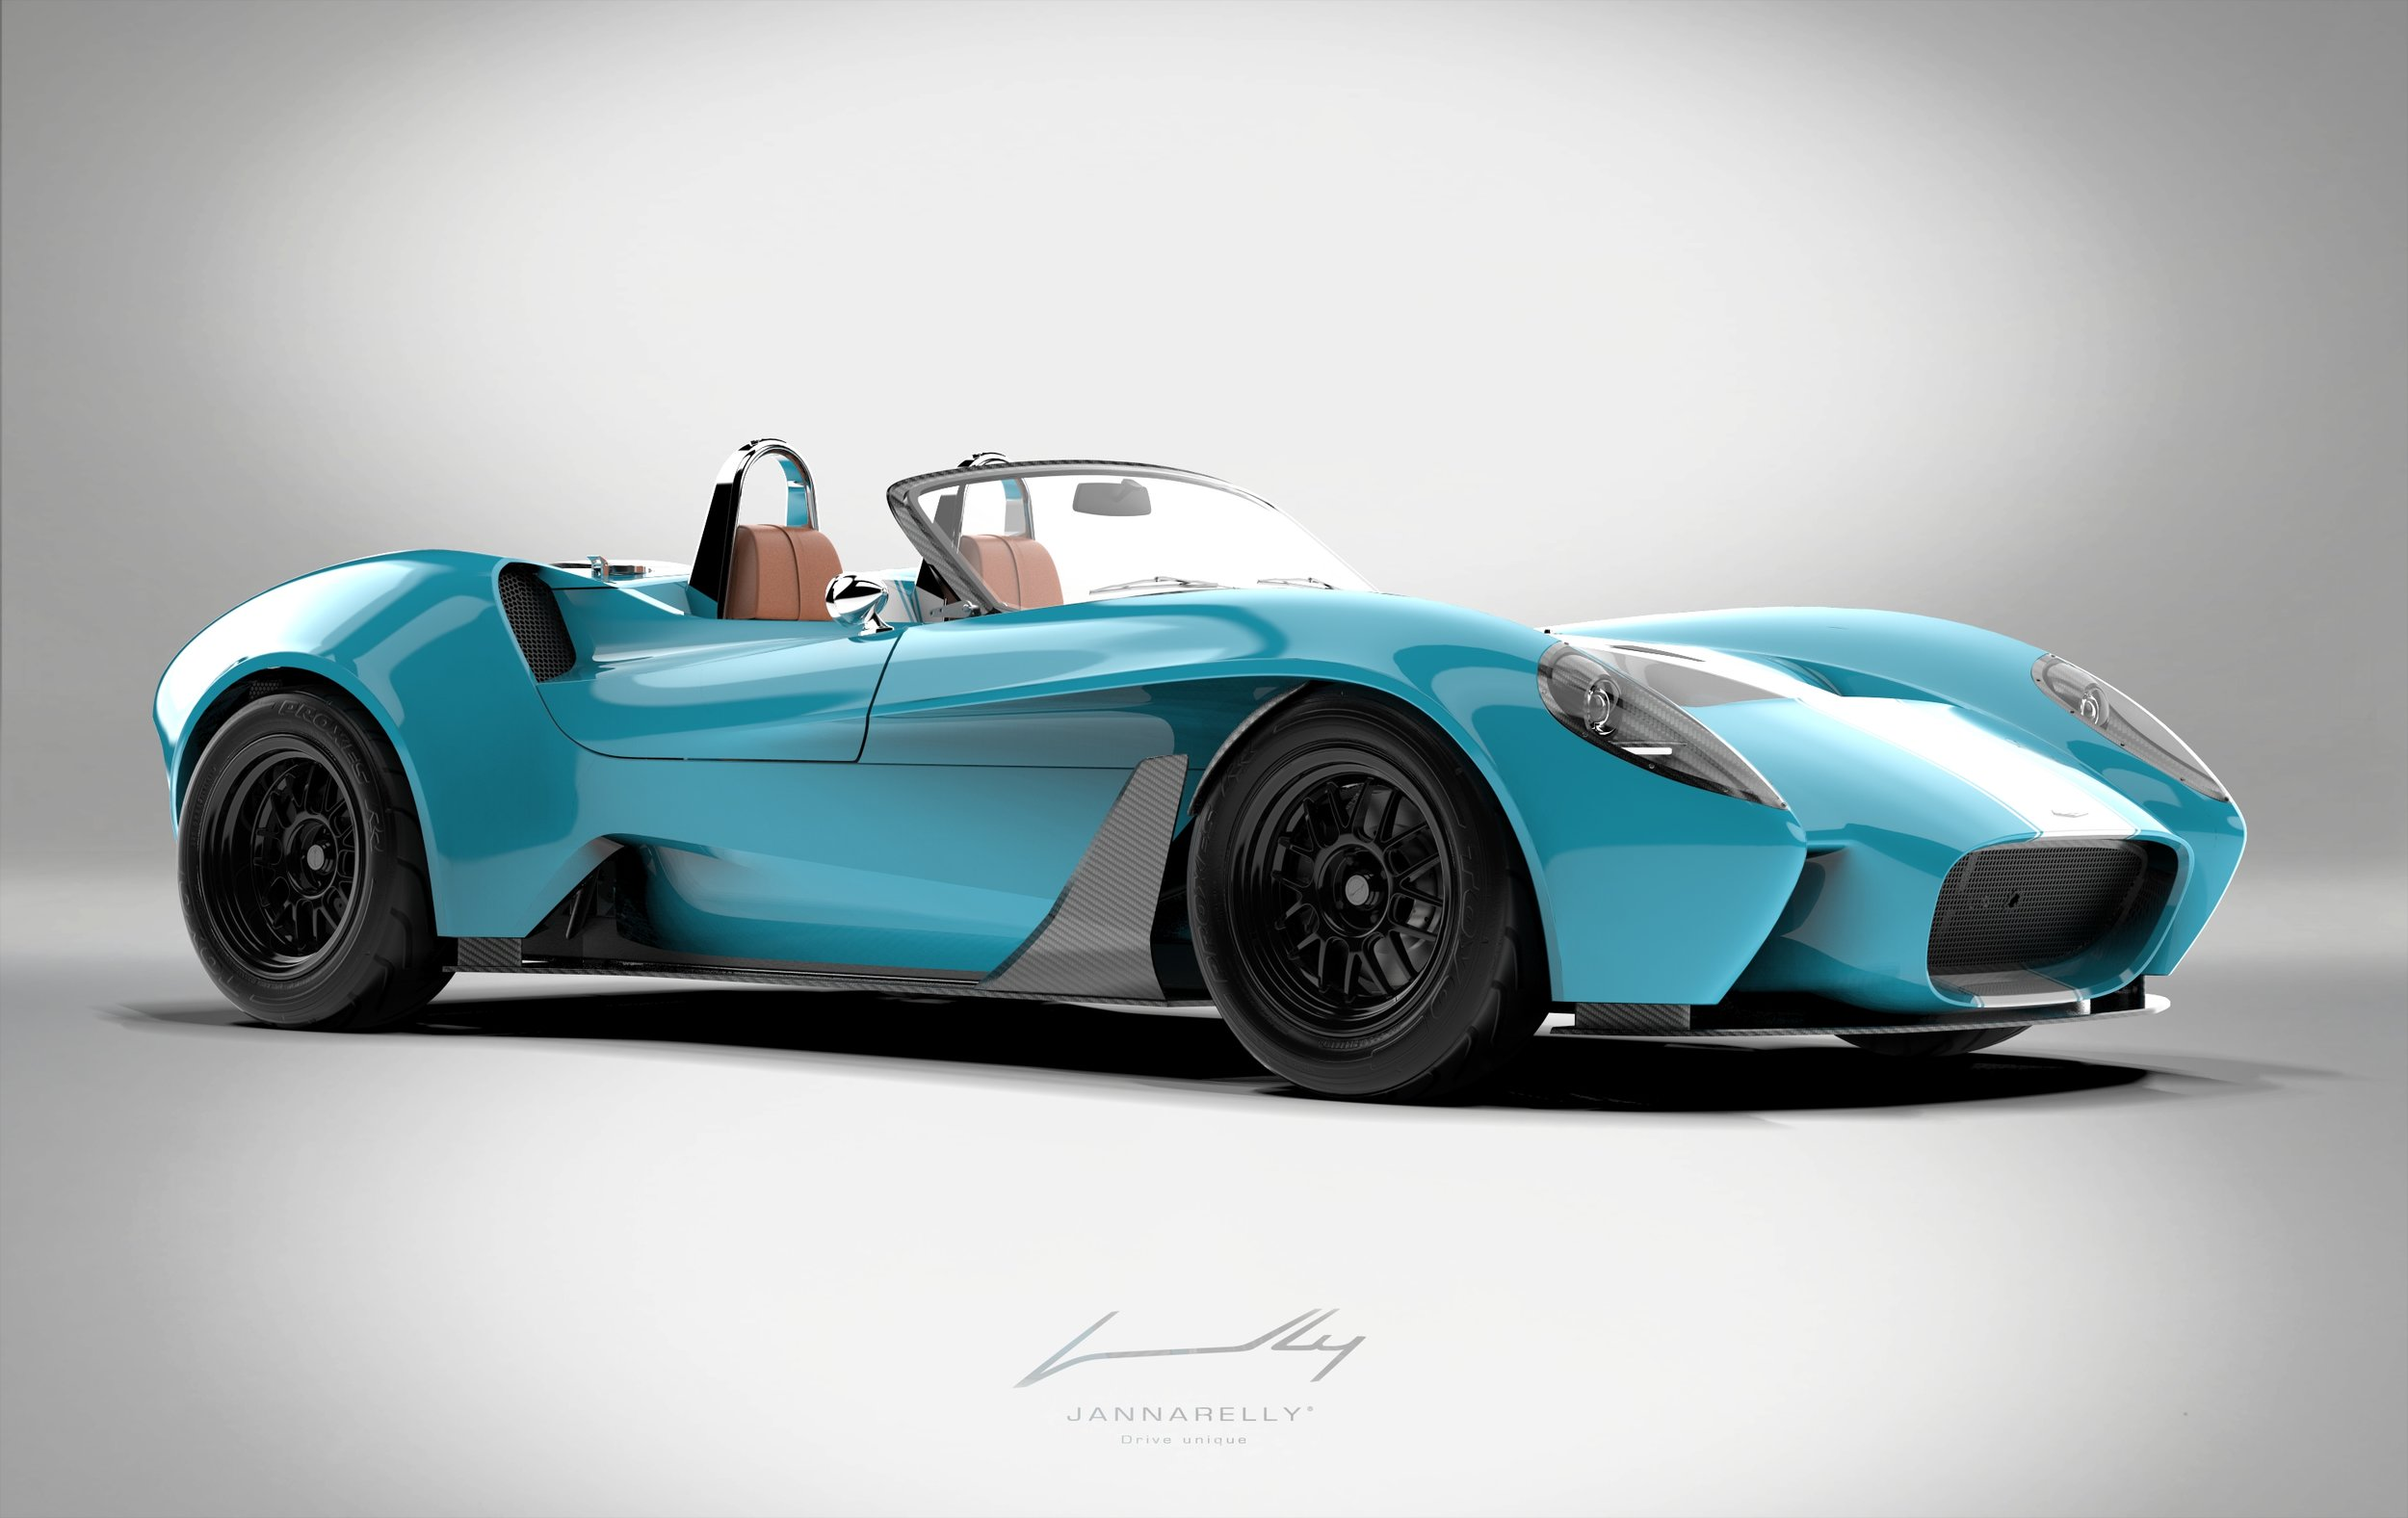 J design1 roadster.317.jpg